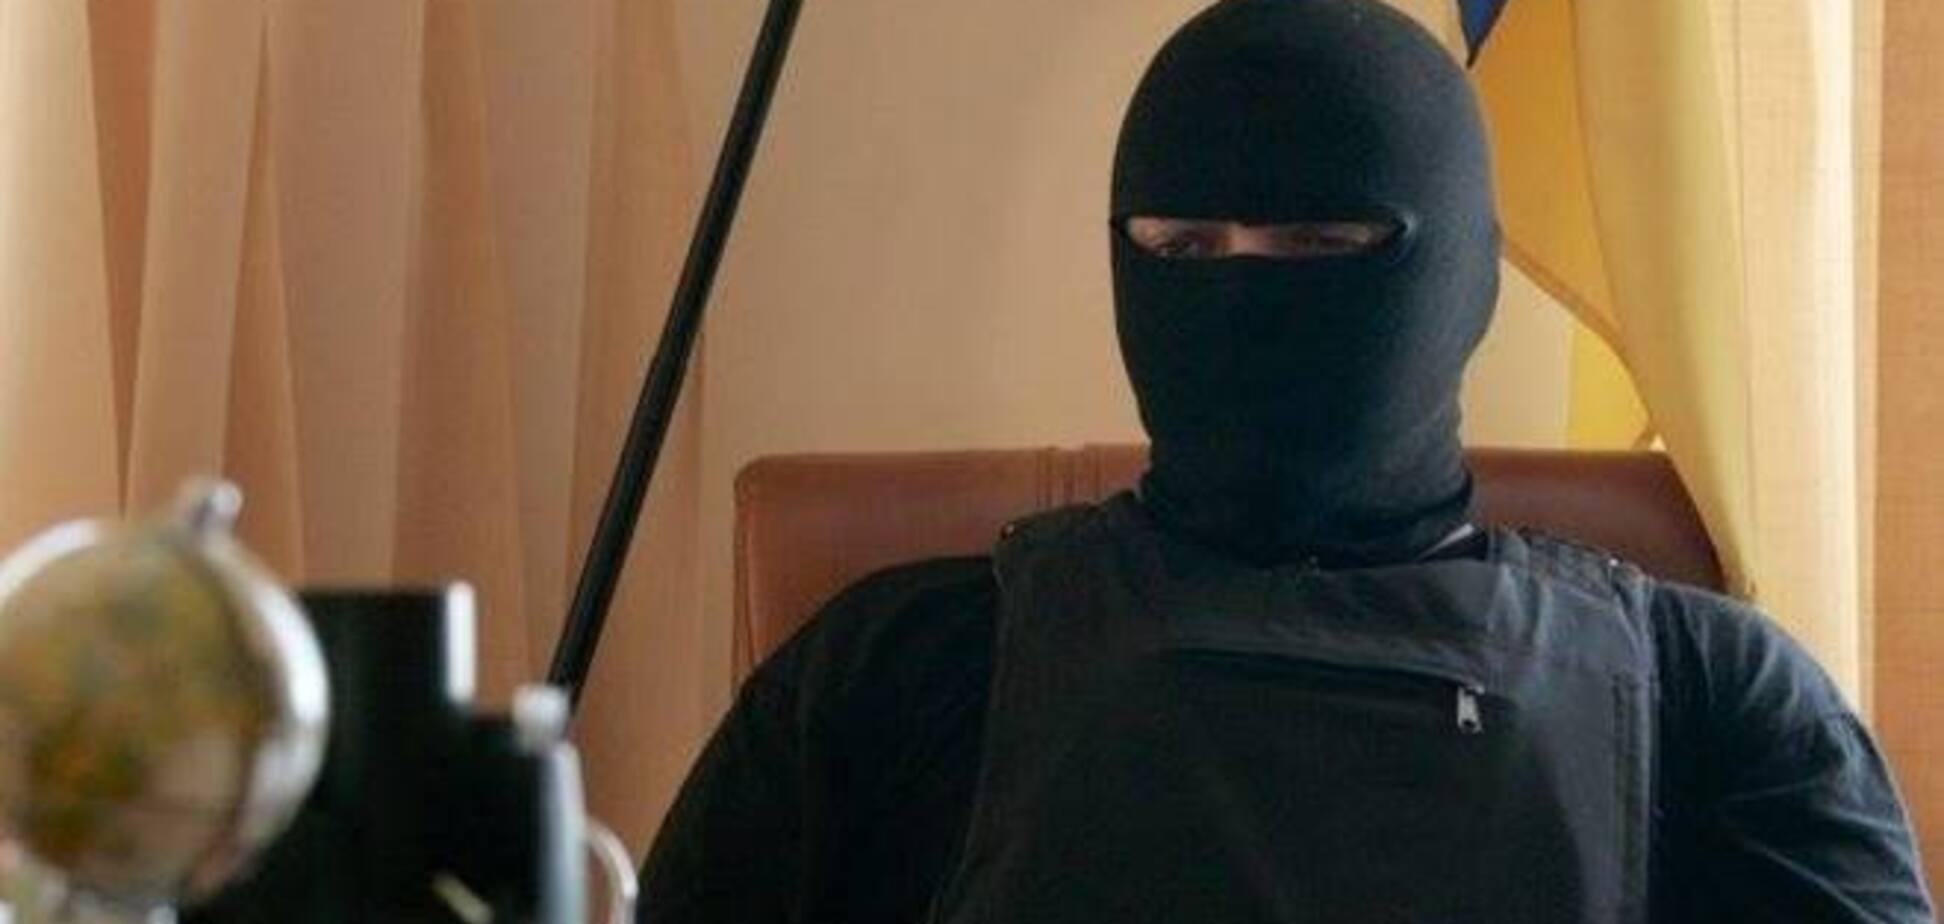 Командир батальона 'Донбасс' выдвинул ультиматум террористам